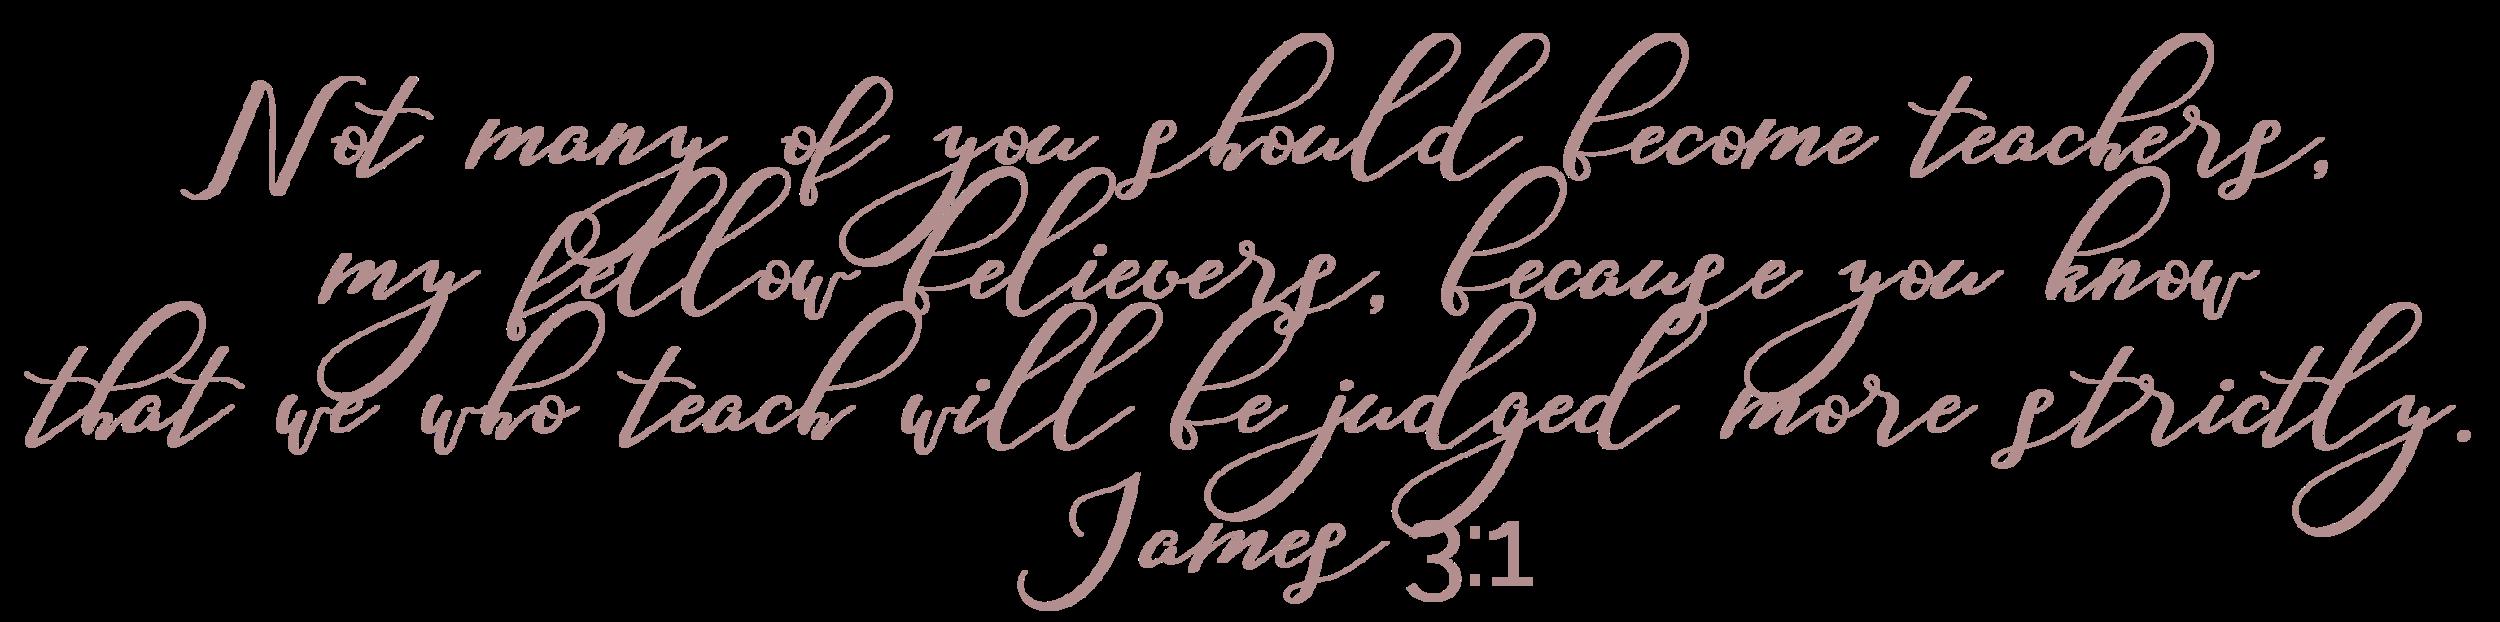 JAMES 3.1.png